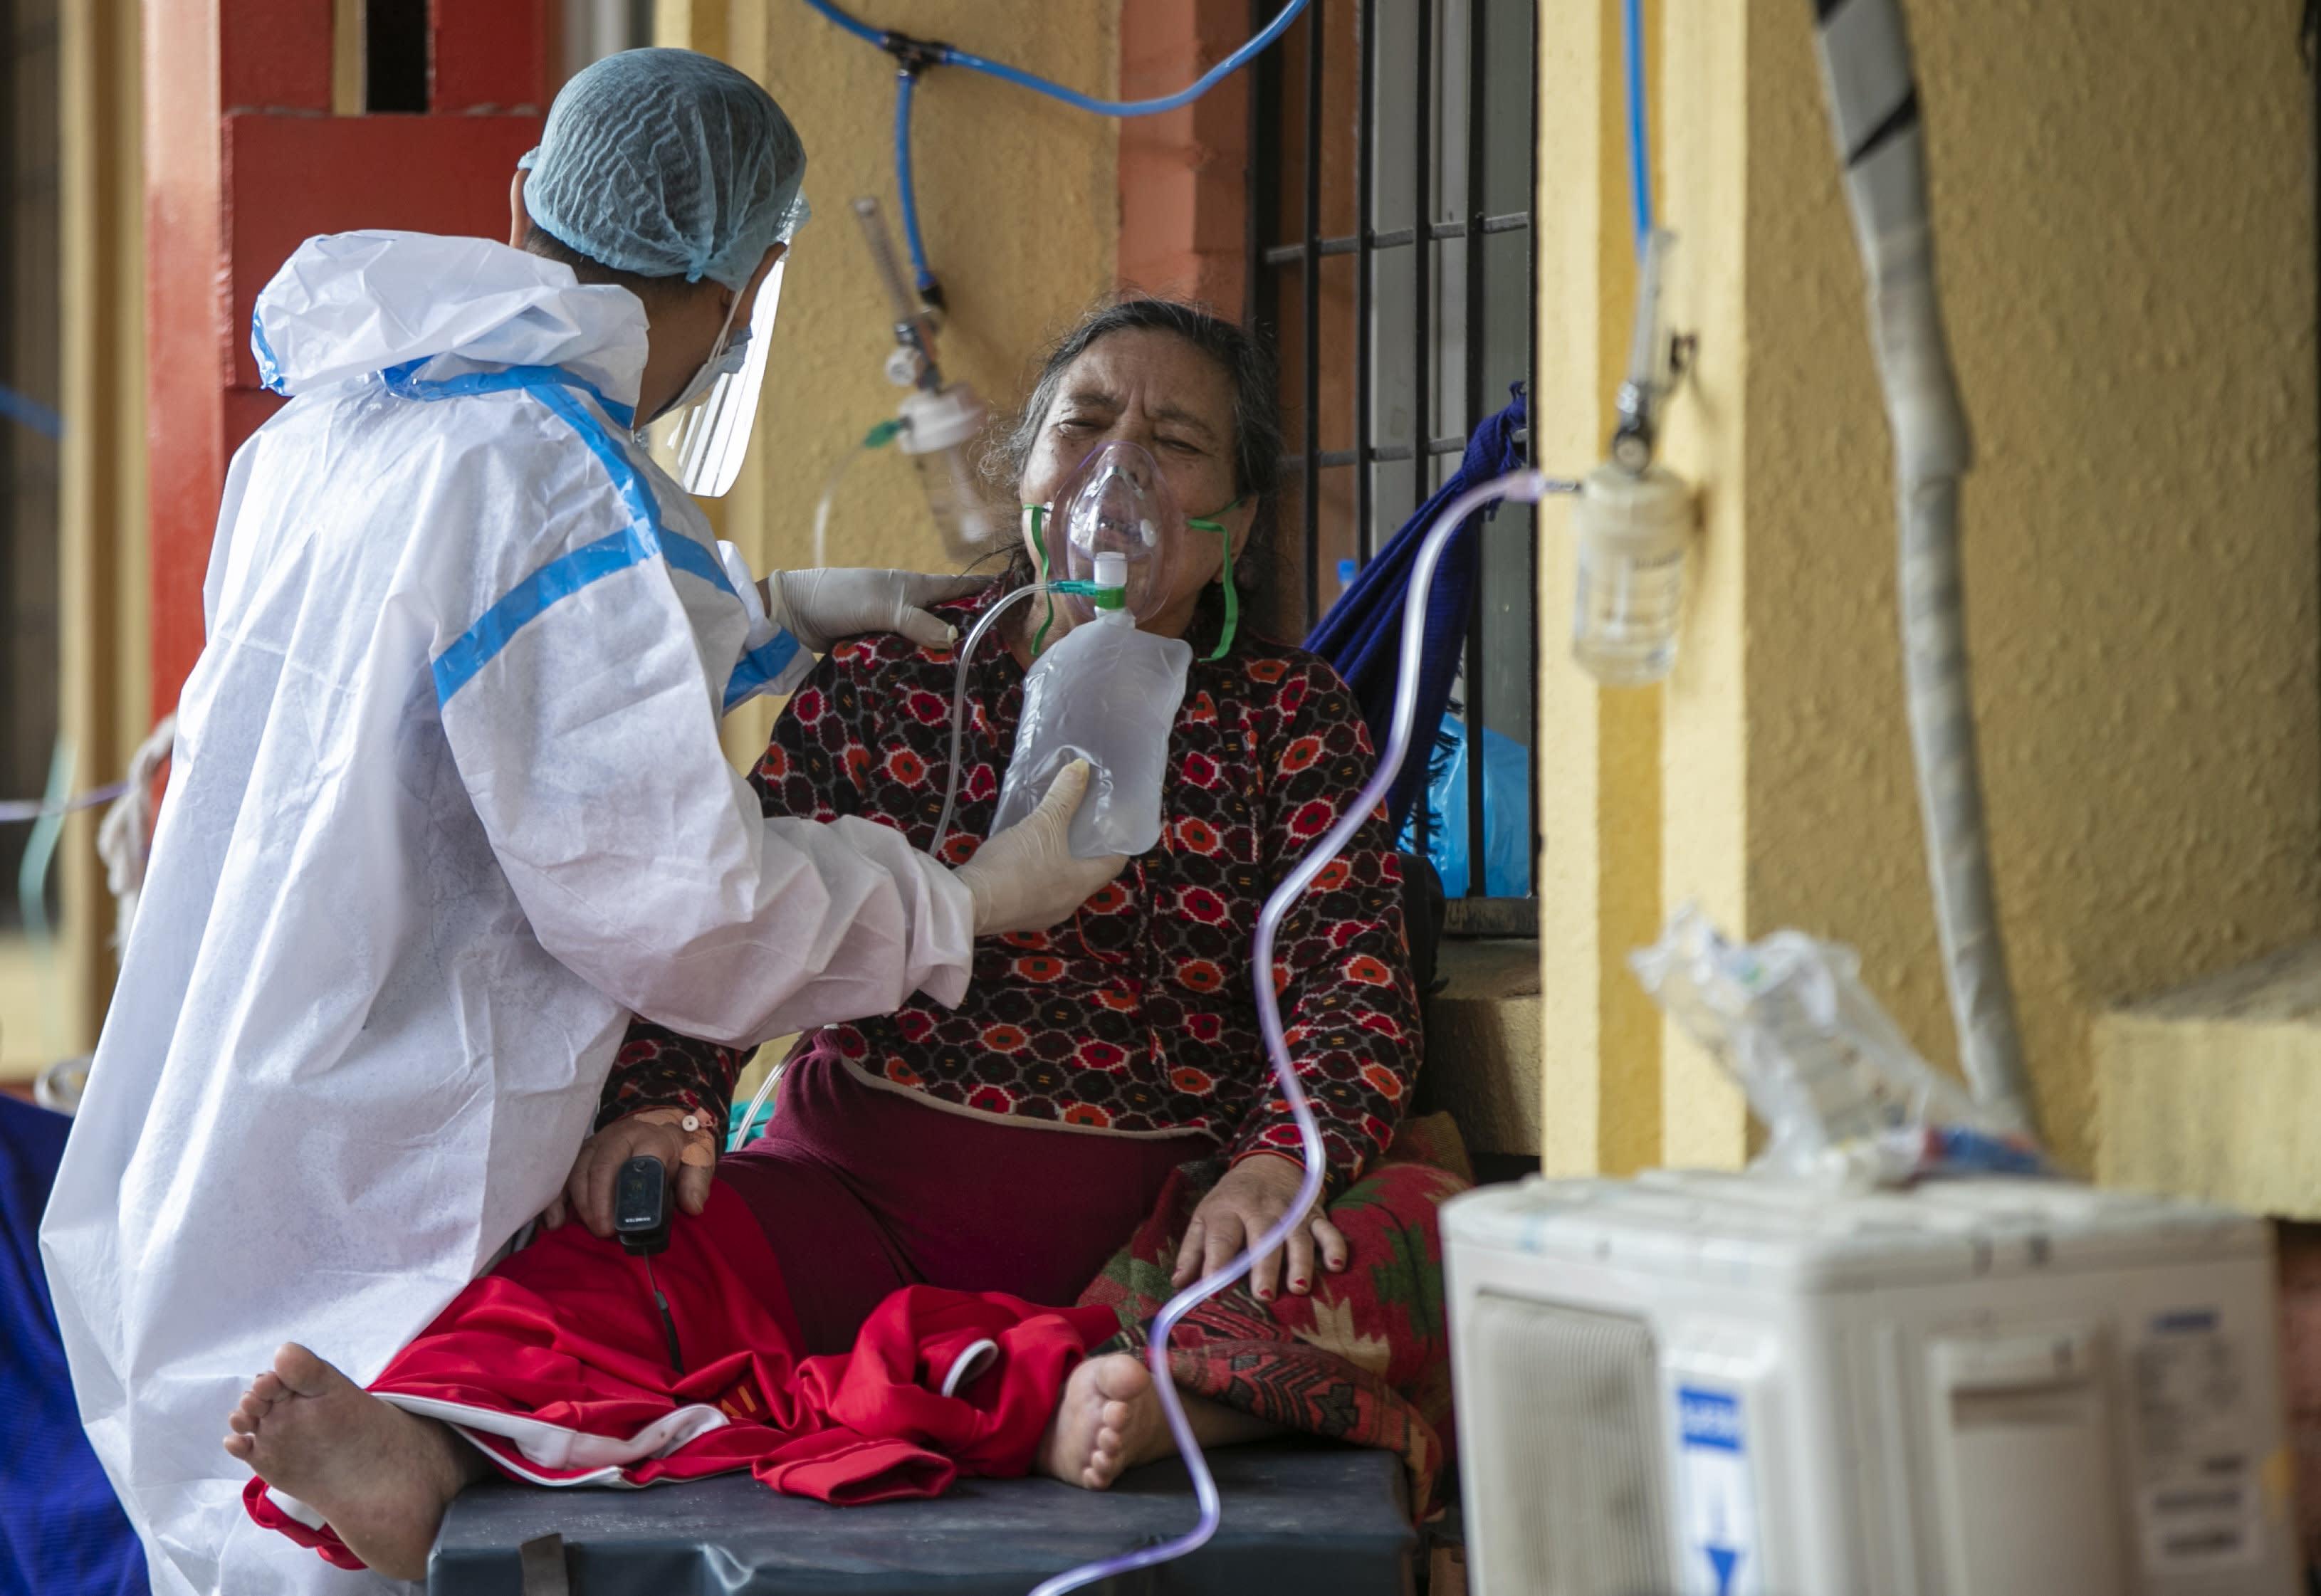 Political turmoil returns as Nepal suffers worst COVID surge